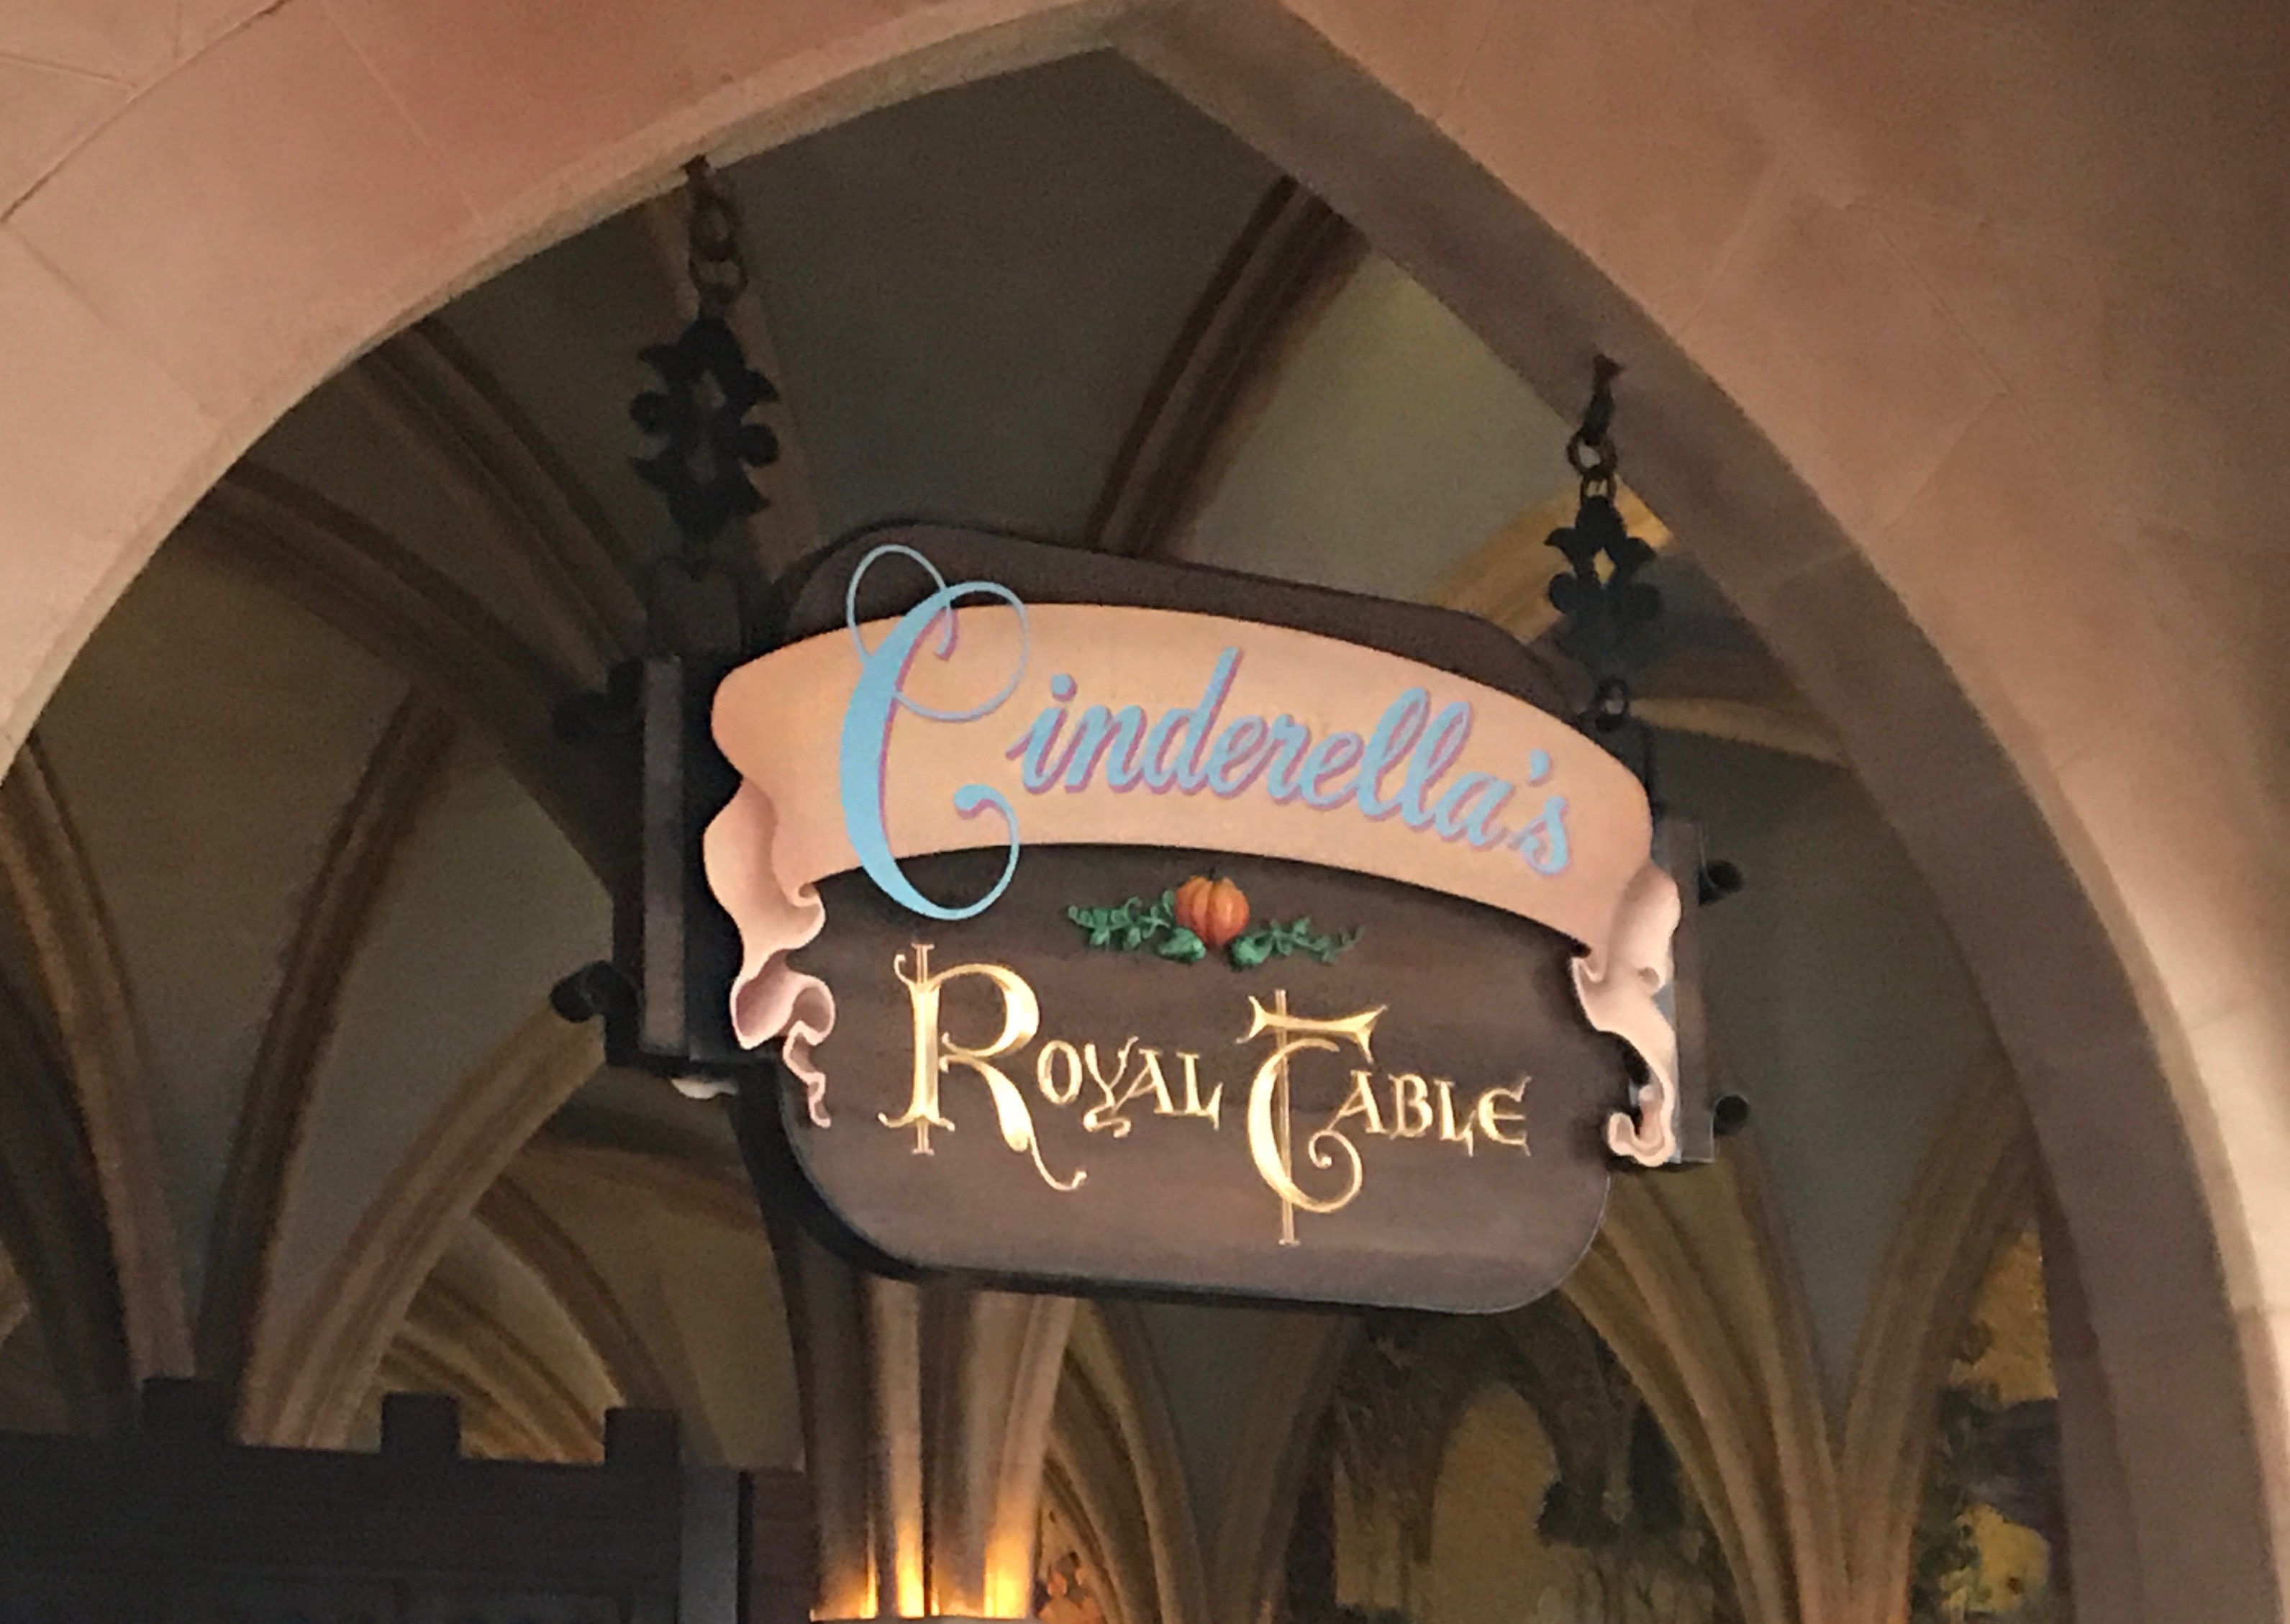 Cinderella's Royal Table in Disney World